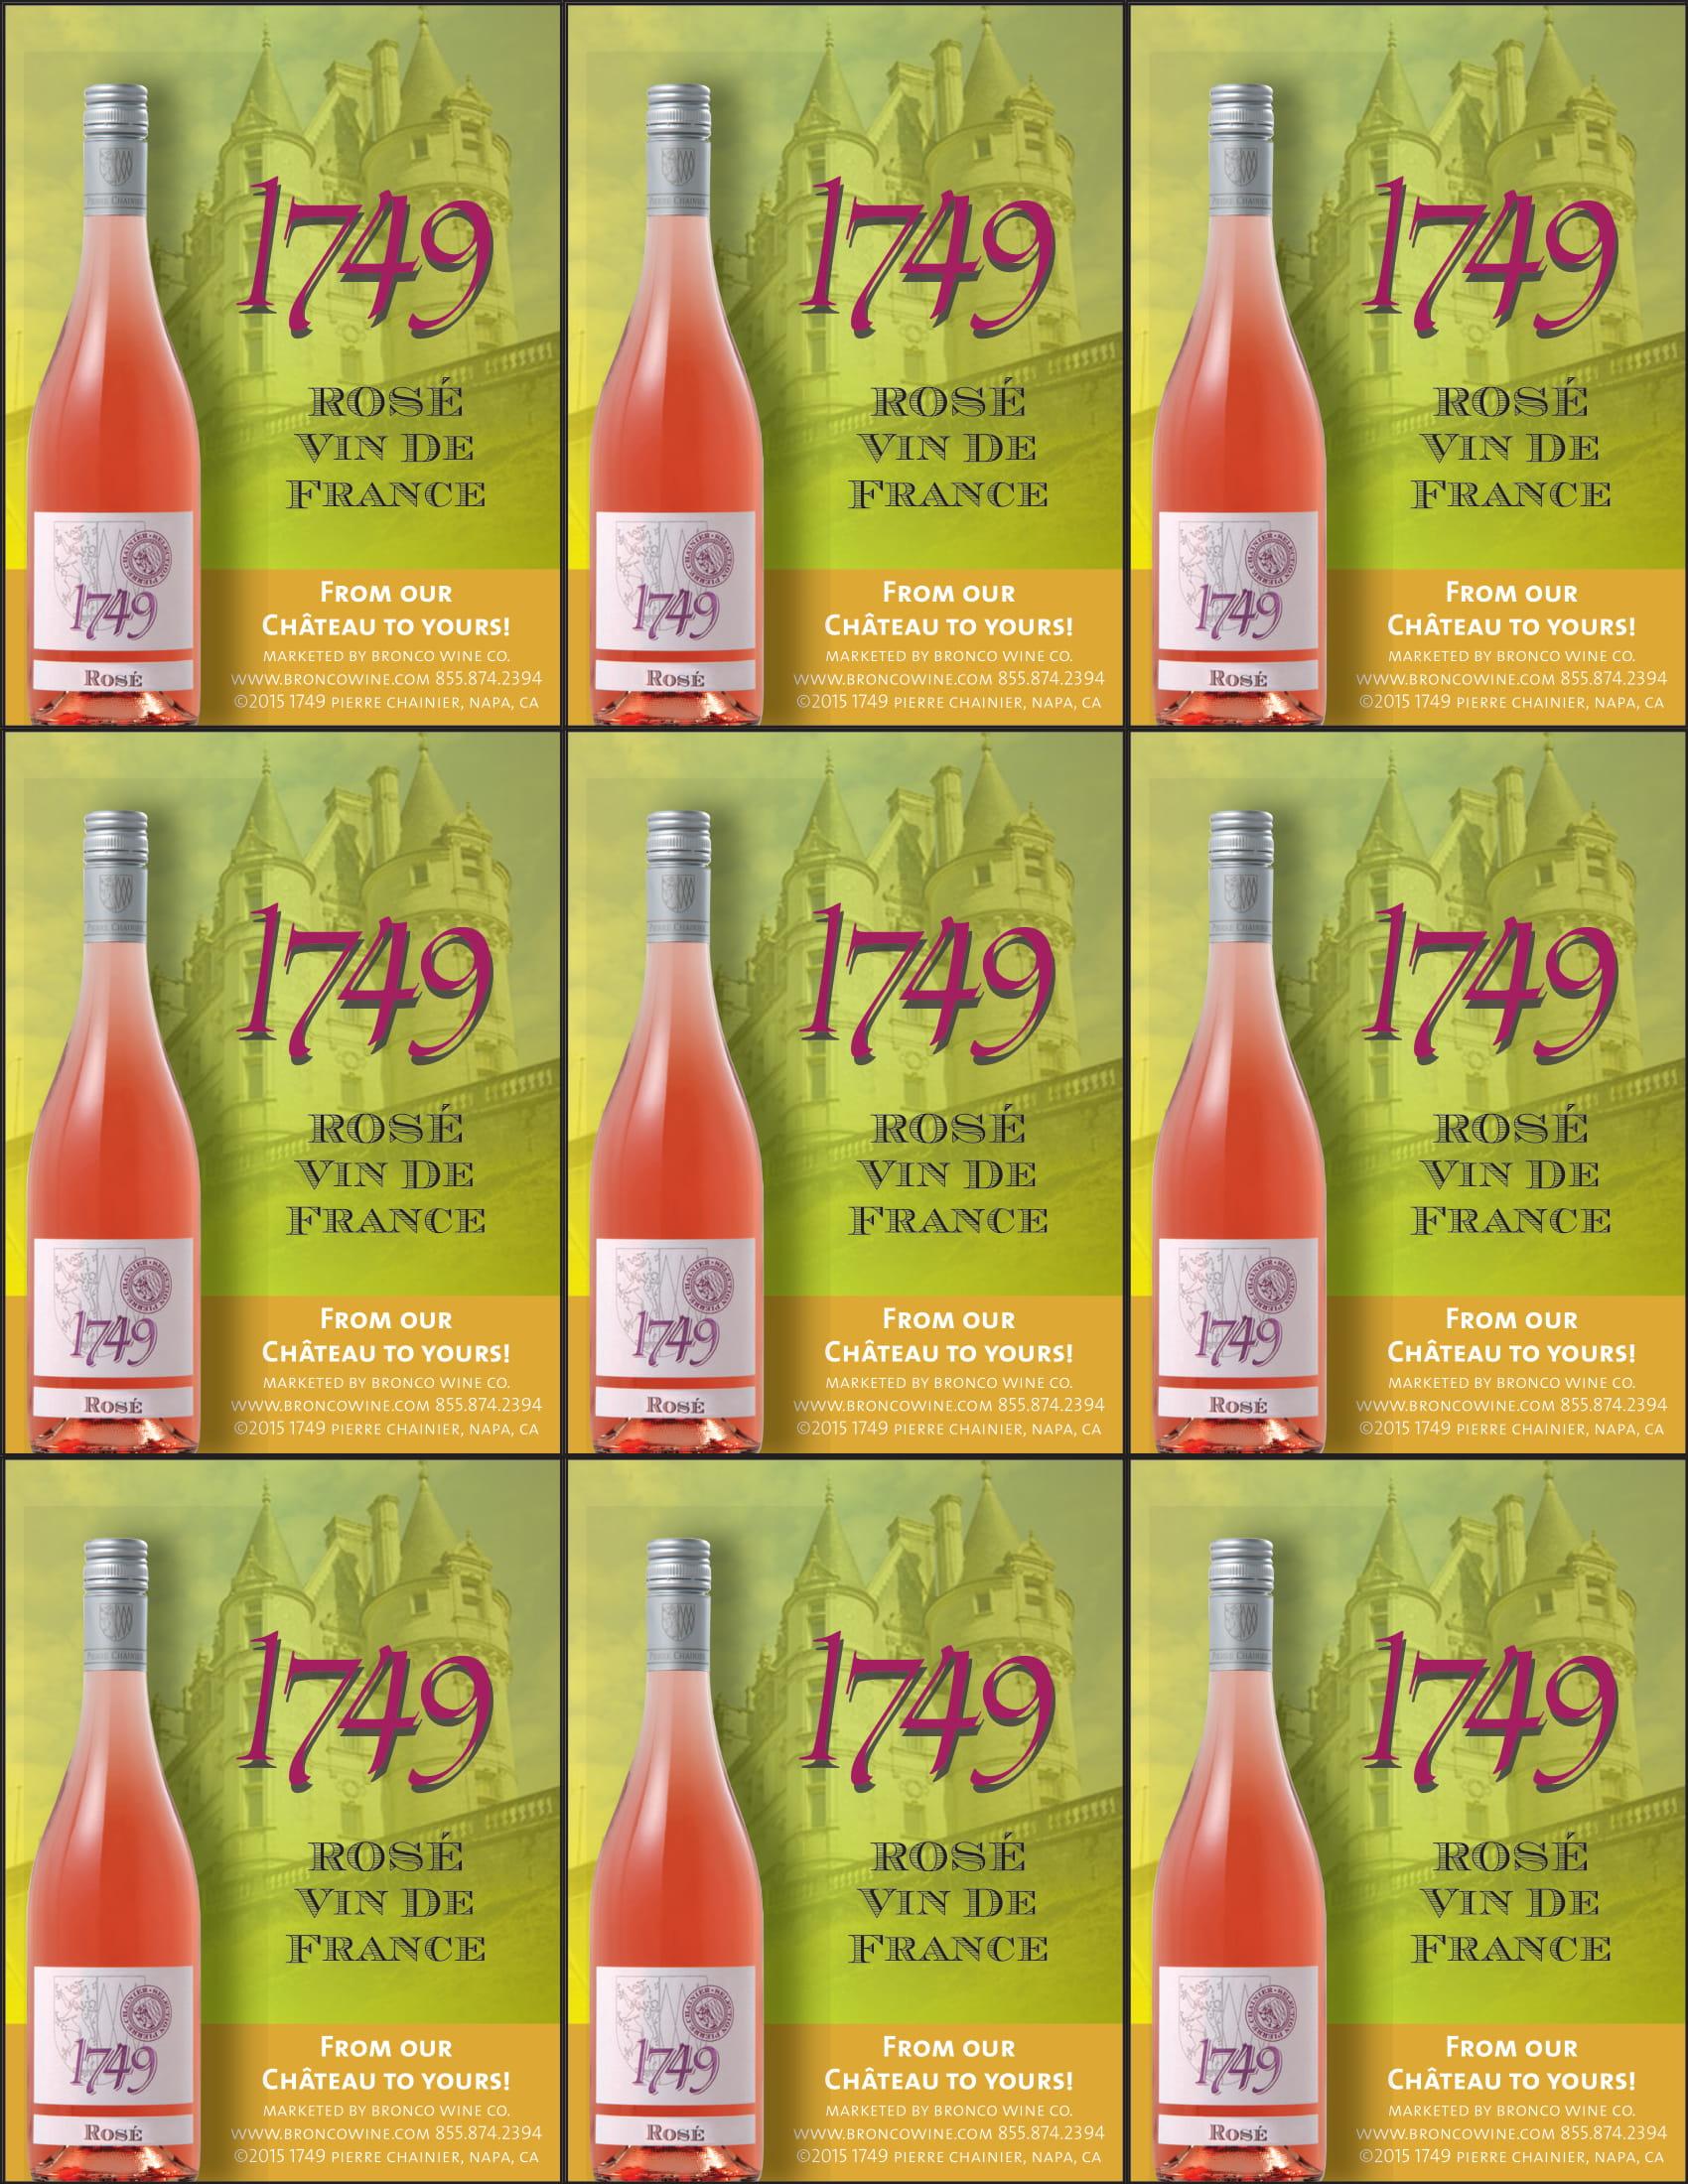 1749 Rosé Shelf Talkers